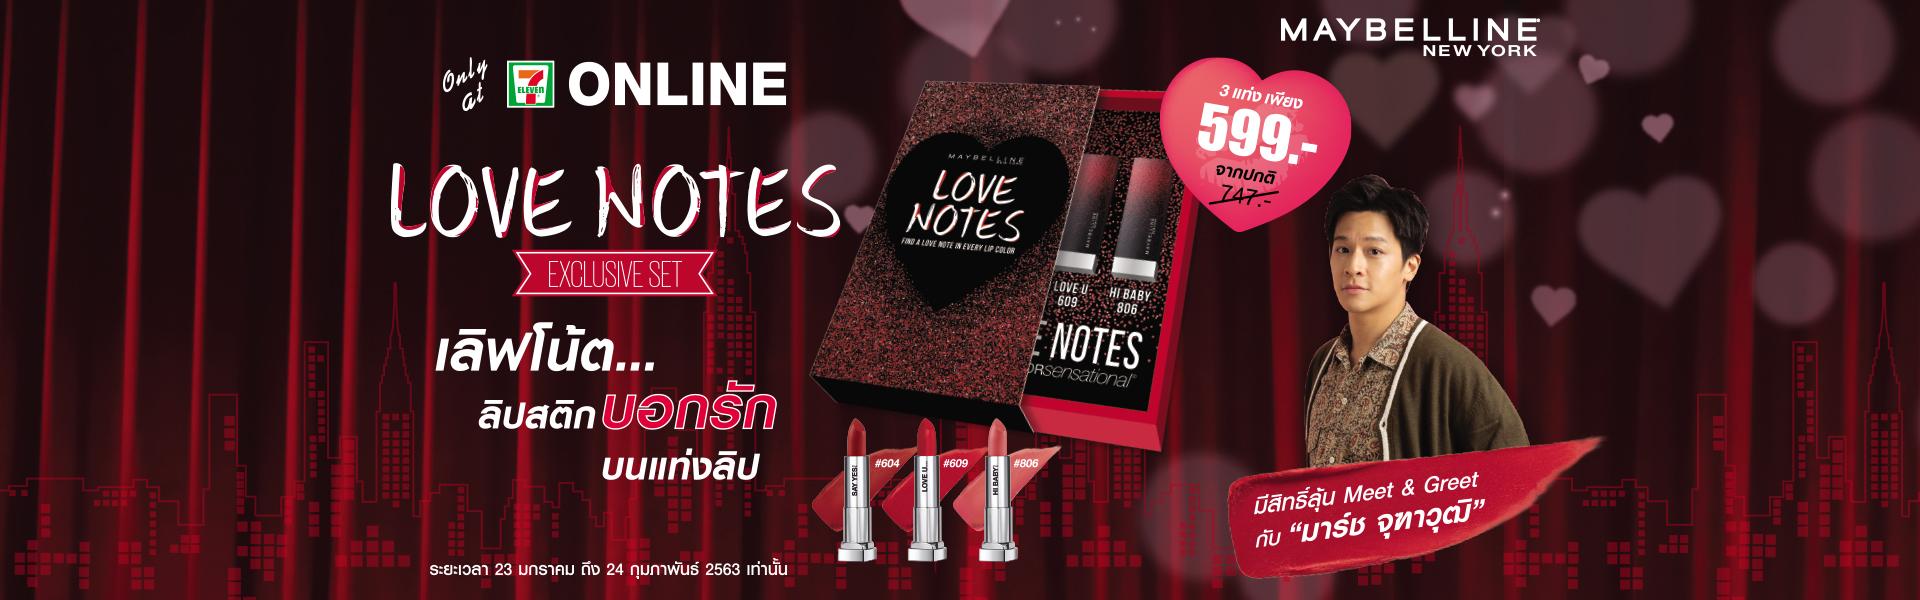 Maybelline Love Notes : เลิฟโน้ตสุดฟิน จิ้นกับมาร์ช จุฑาวุฒิ